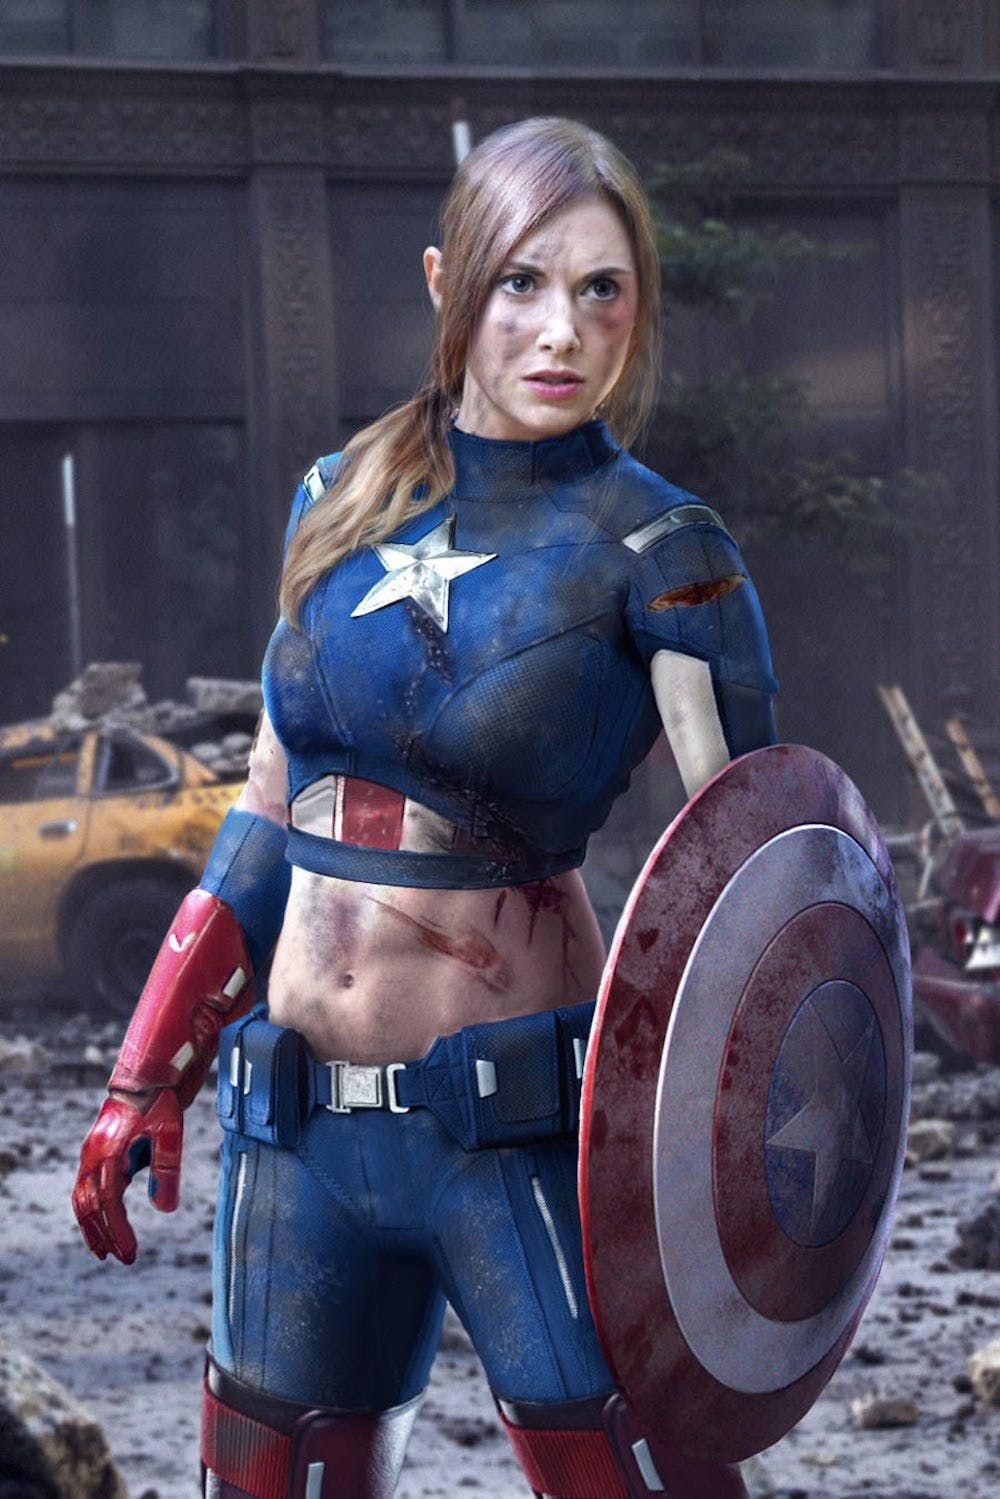 18+ Pt.Jensen Captain America A XXX Parody Blry 2020 English 720p HDRip 400MB